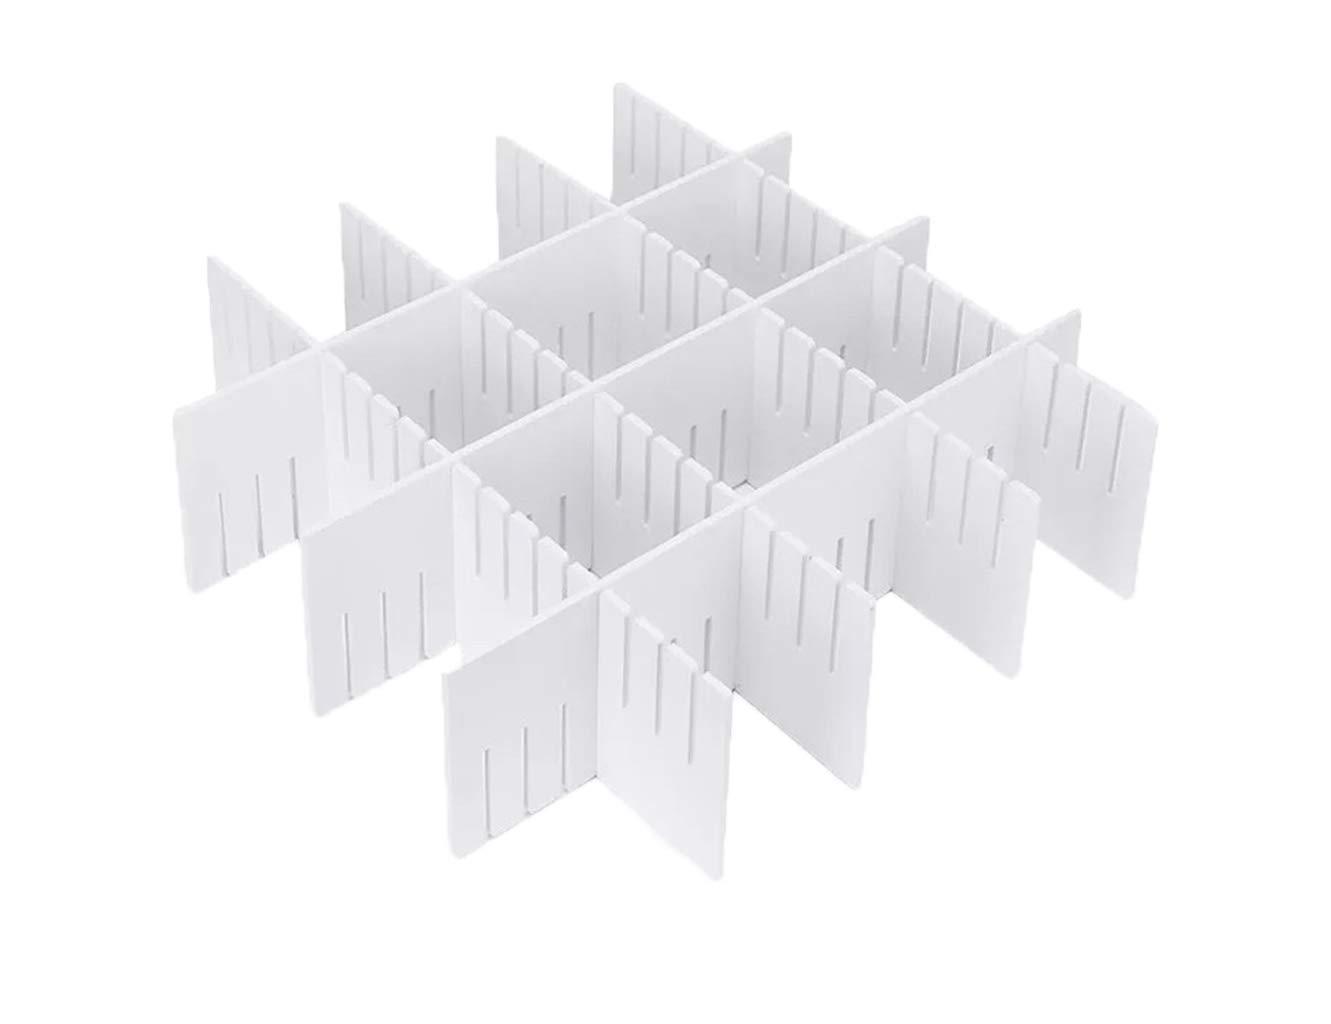 Tuersan DIY Grid Drawer Organizer Drawer Dividers Wood-Plastic Storage Spacer Multipurpose Finishing Shelves for Closet Wardrobe Desk Tea Table Dresser Kitchen Underwear Socks Tableware White(7Pack)